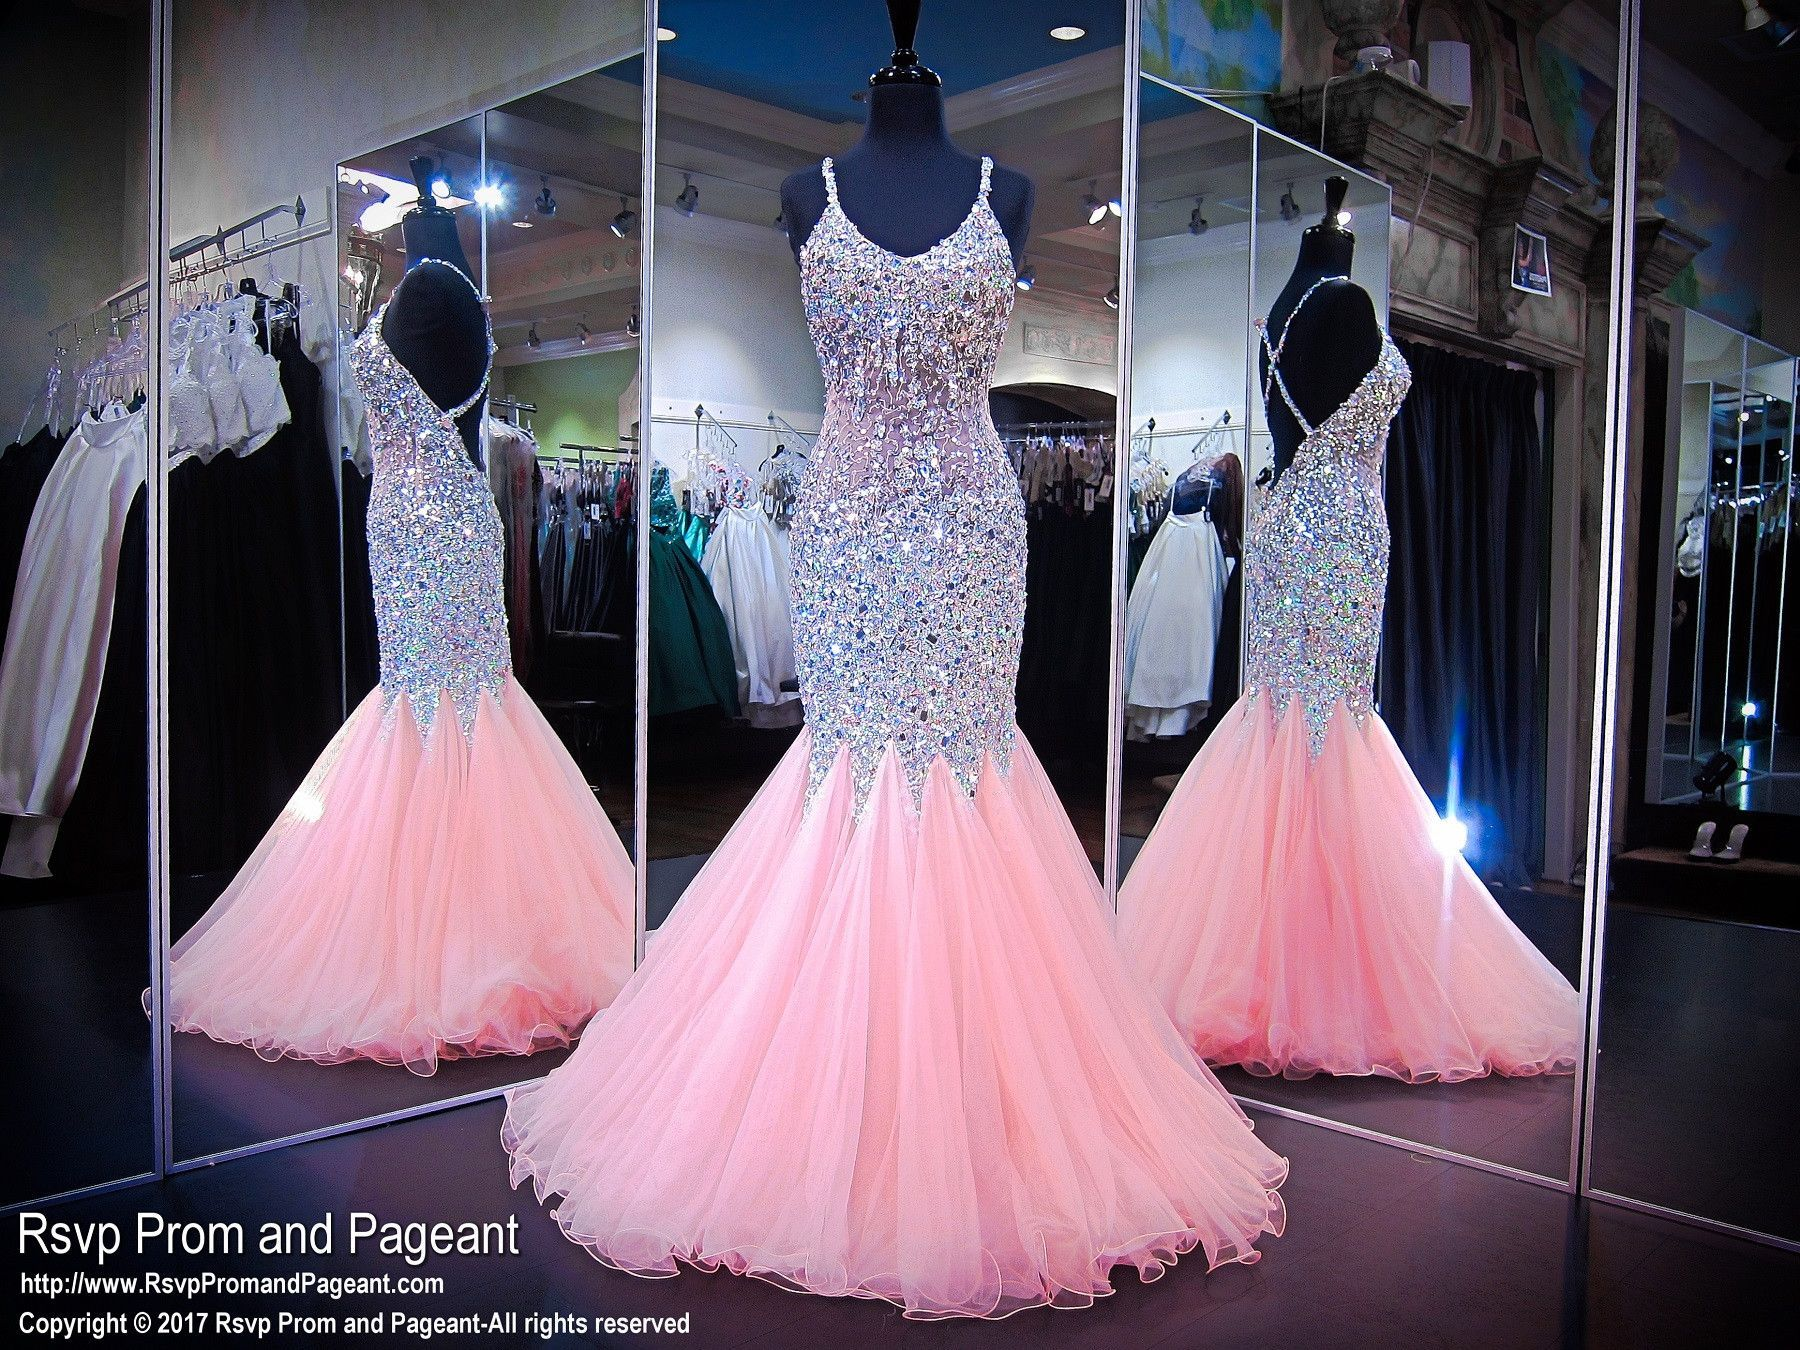 Light Pink Beaded Mermaid Prom Dress | Prommmm! | Pinterest | Prom ...